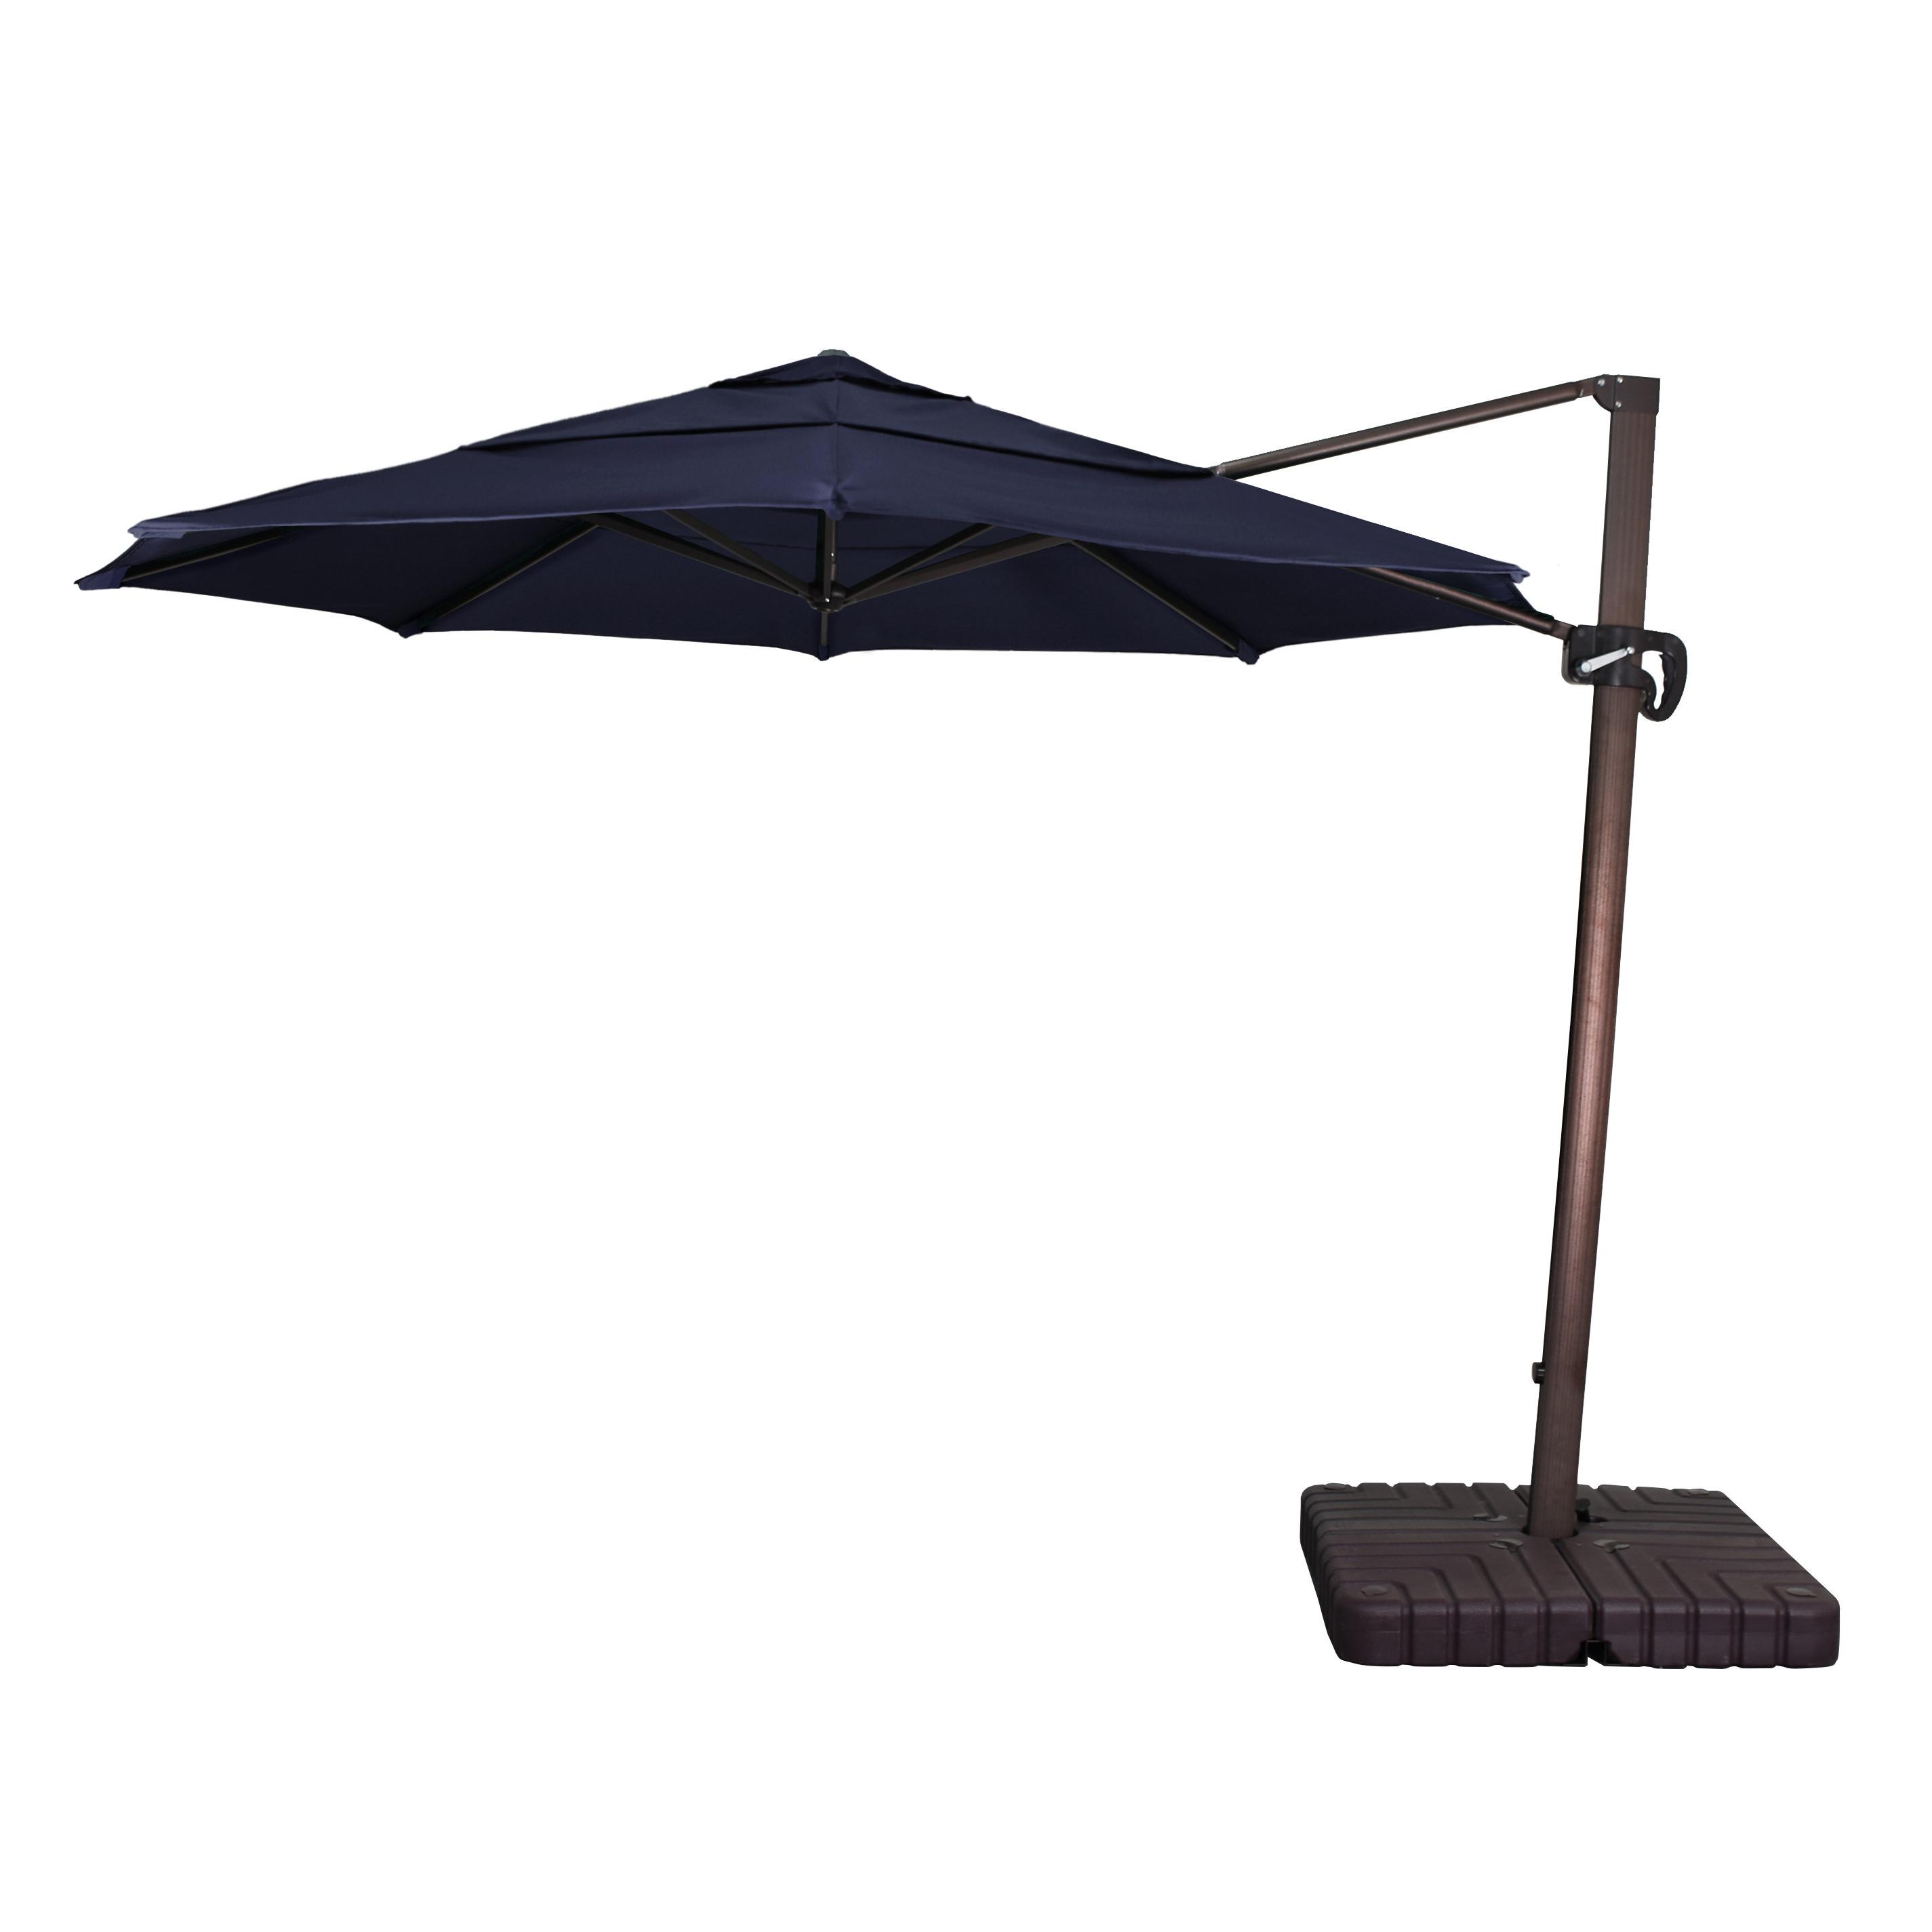 2019 Carlisle Square Cantilever Sunbrella Umbrellas Throughout Carlisle 11' Cantilever Sunbrella Umbrella (View 2 of 20)